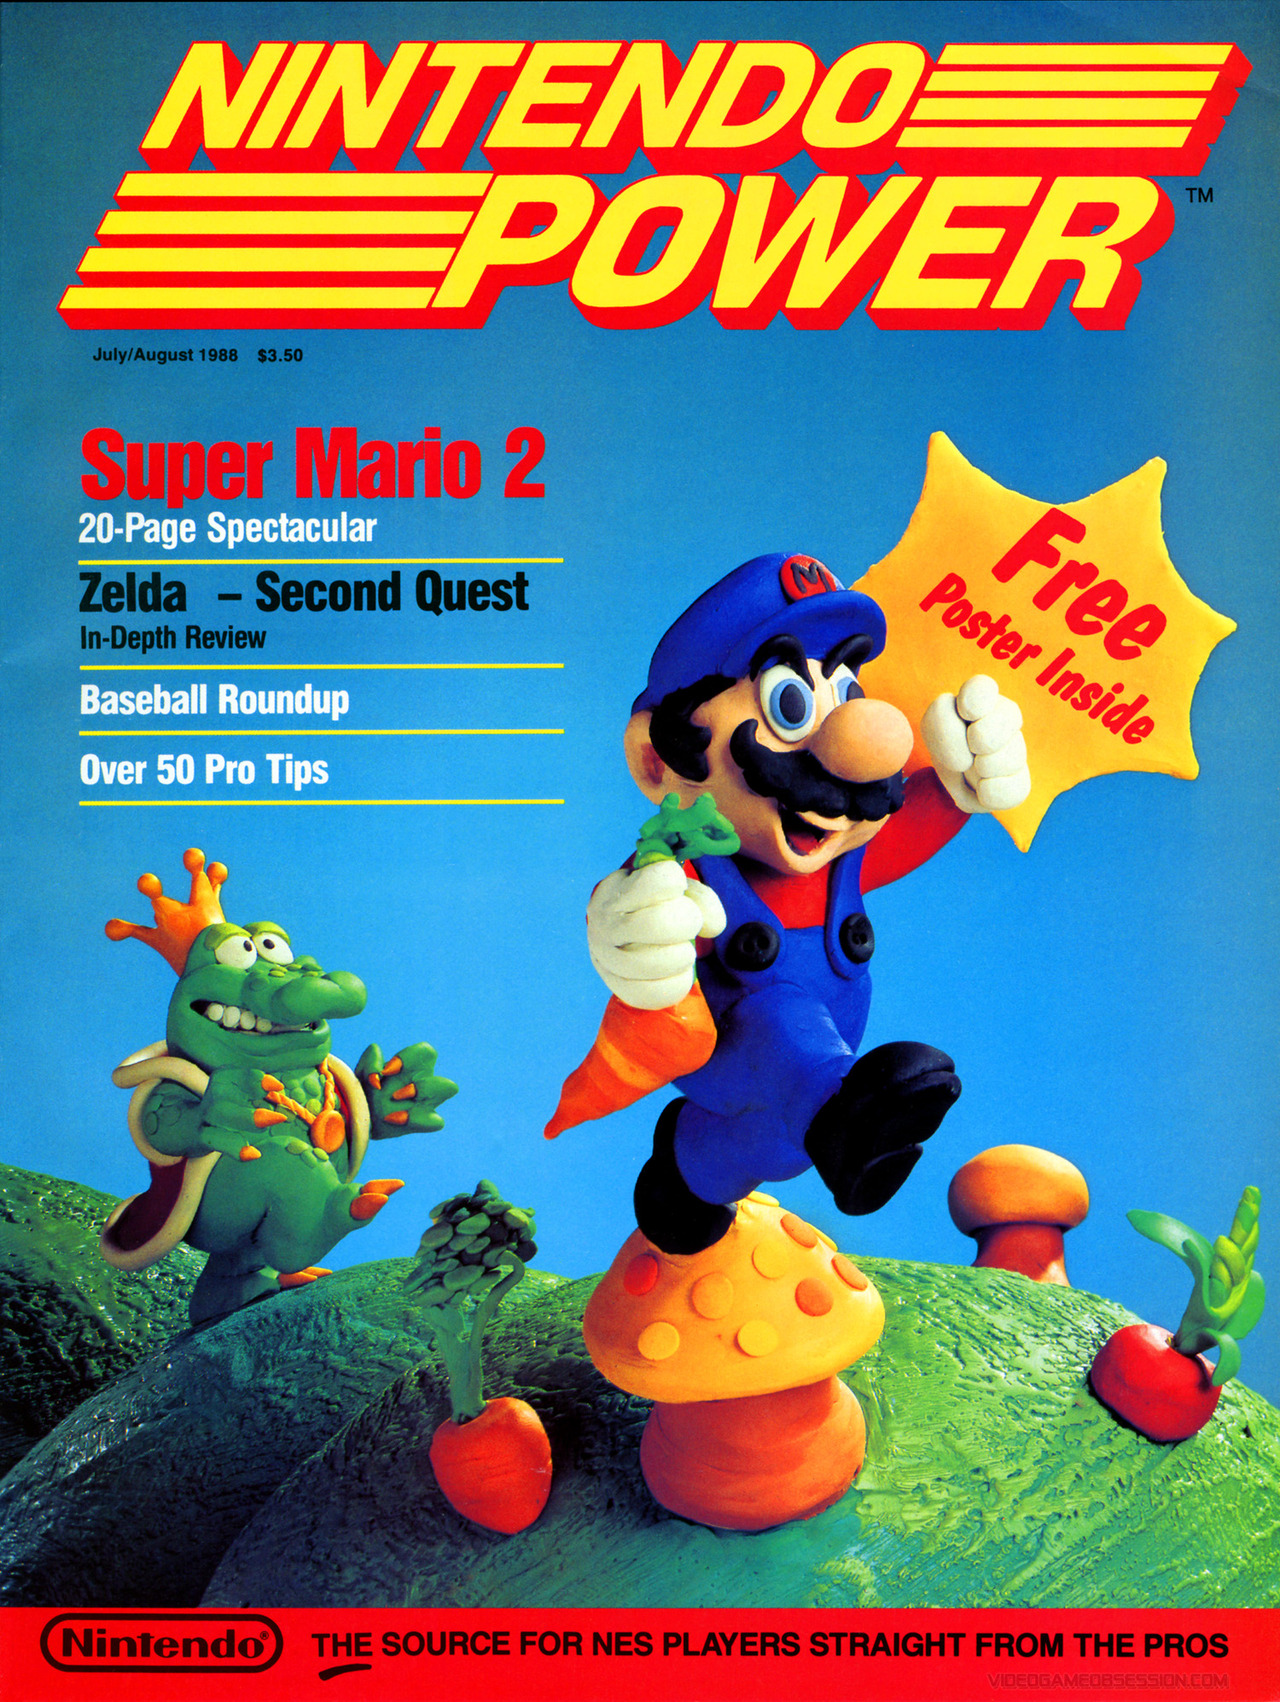 http://img3.wikia.nocookie.net/__cb20120909223212/nintendo/en/images/6/65/Nintendo_Power_Volume_1_-_Scan.png